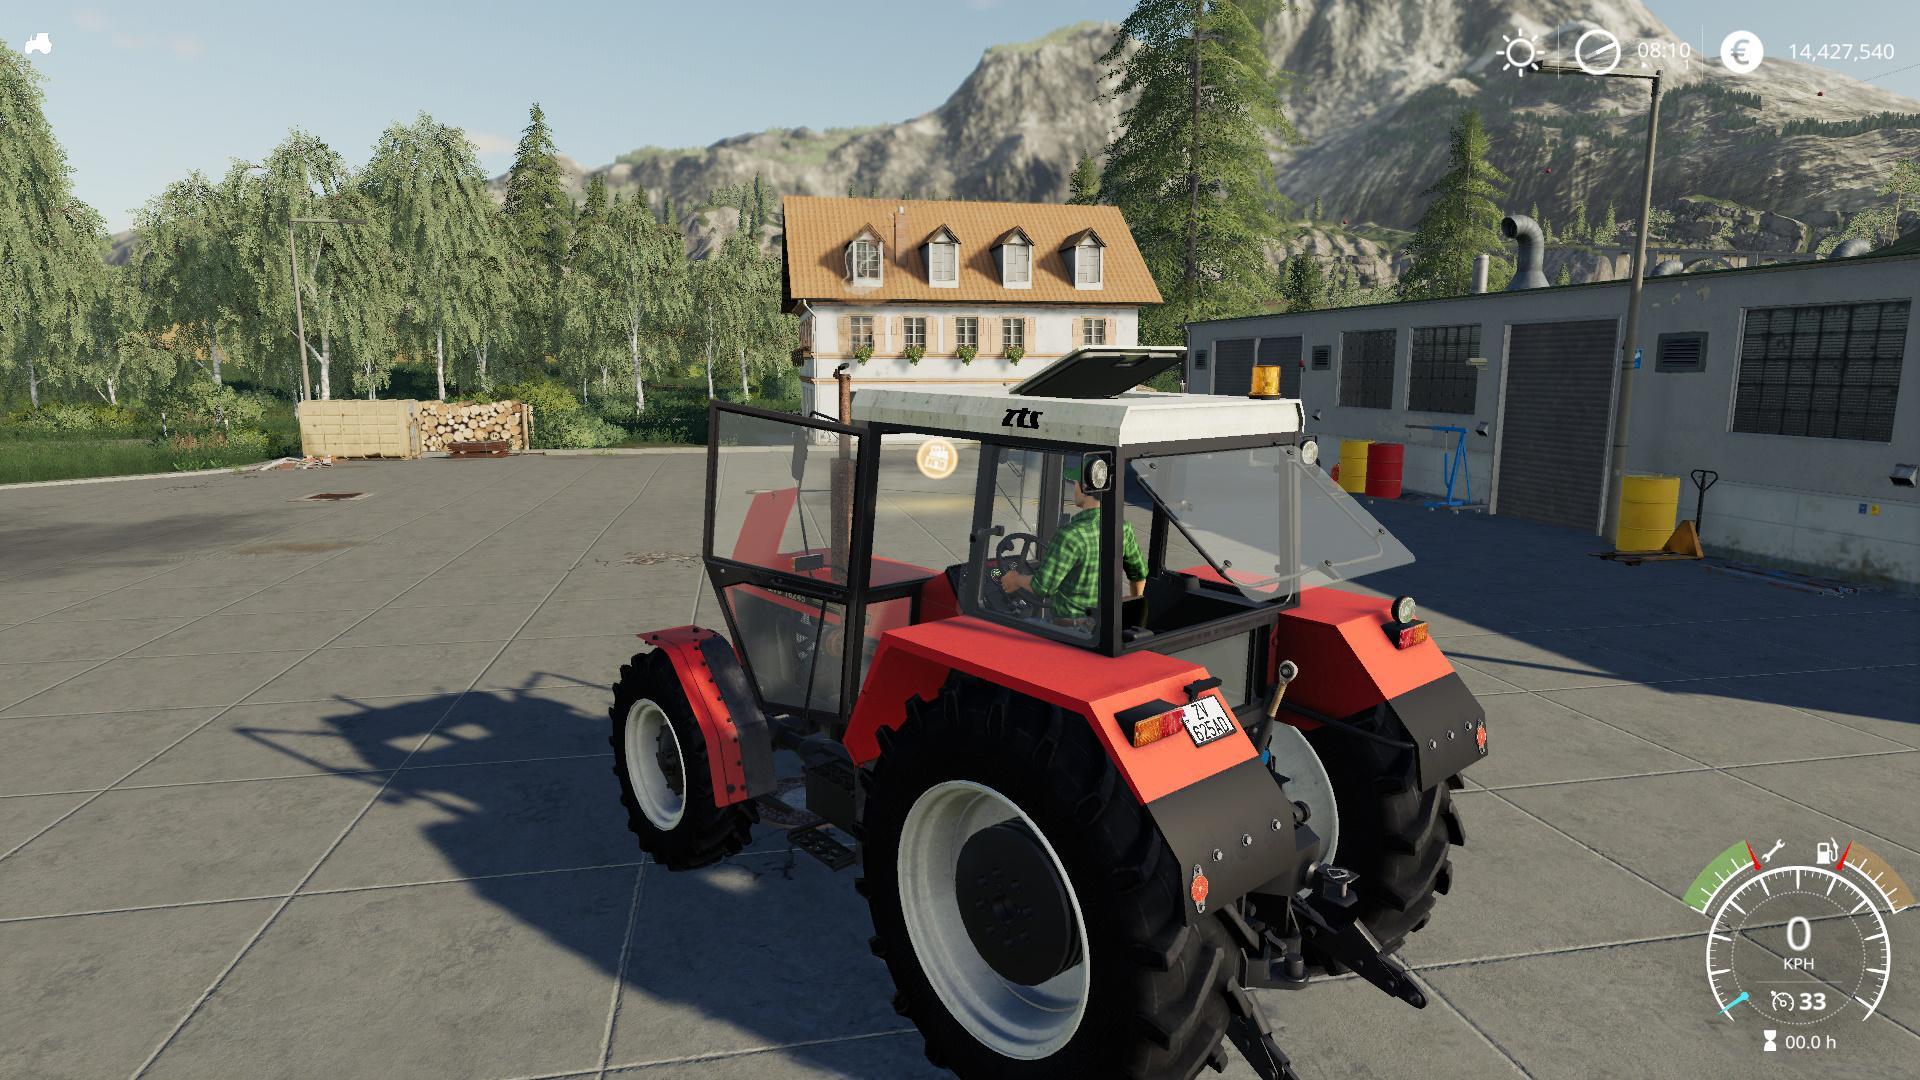 FS19 - Zetor ZTS 16245 Tractor V1.0